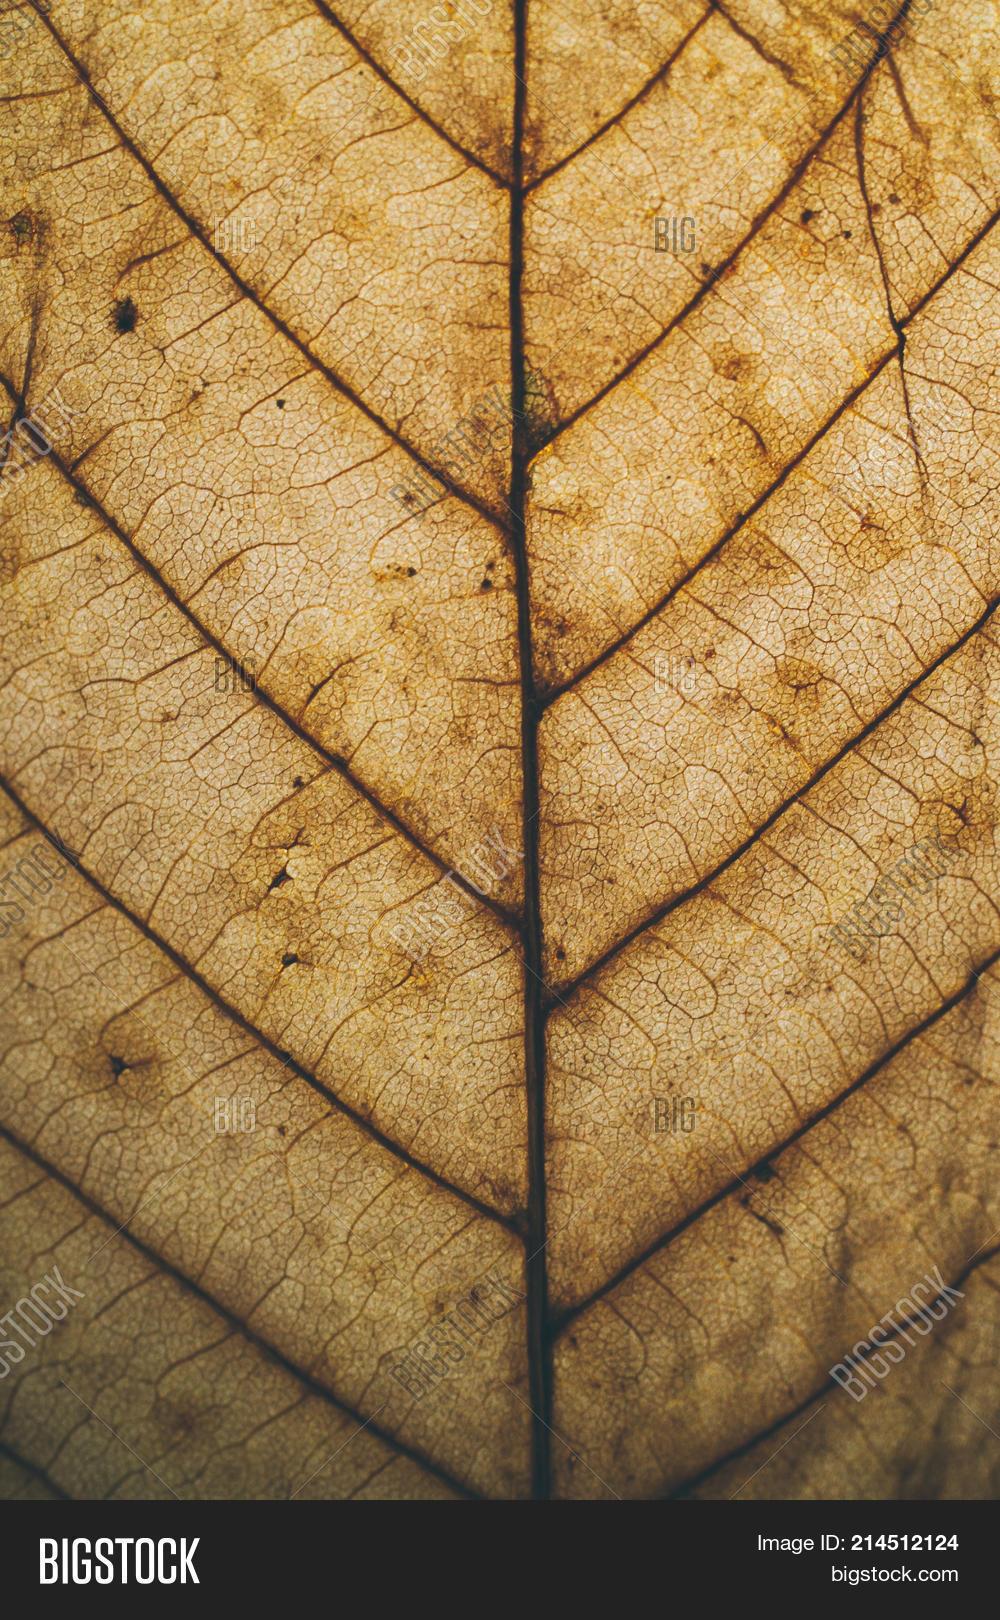 Brown Leaf Texture Image & Photo (Free Trial) | Bigstock